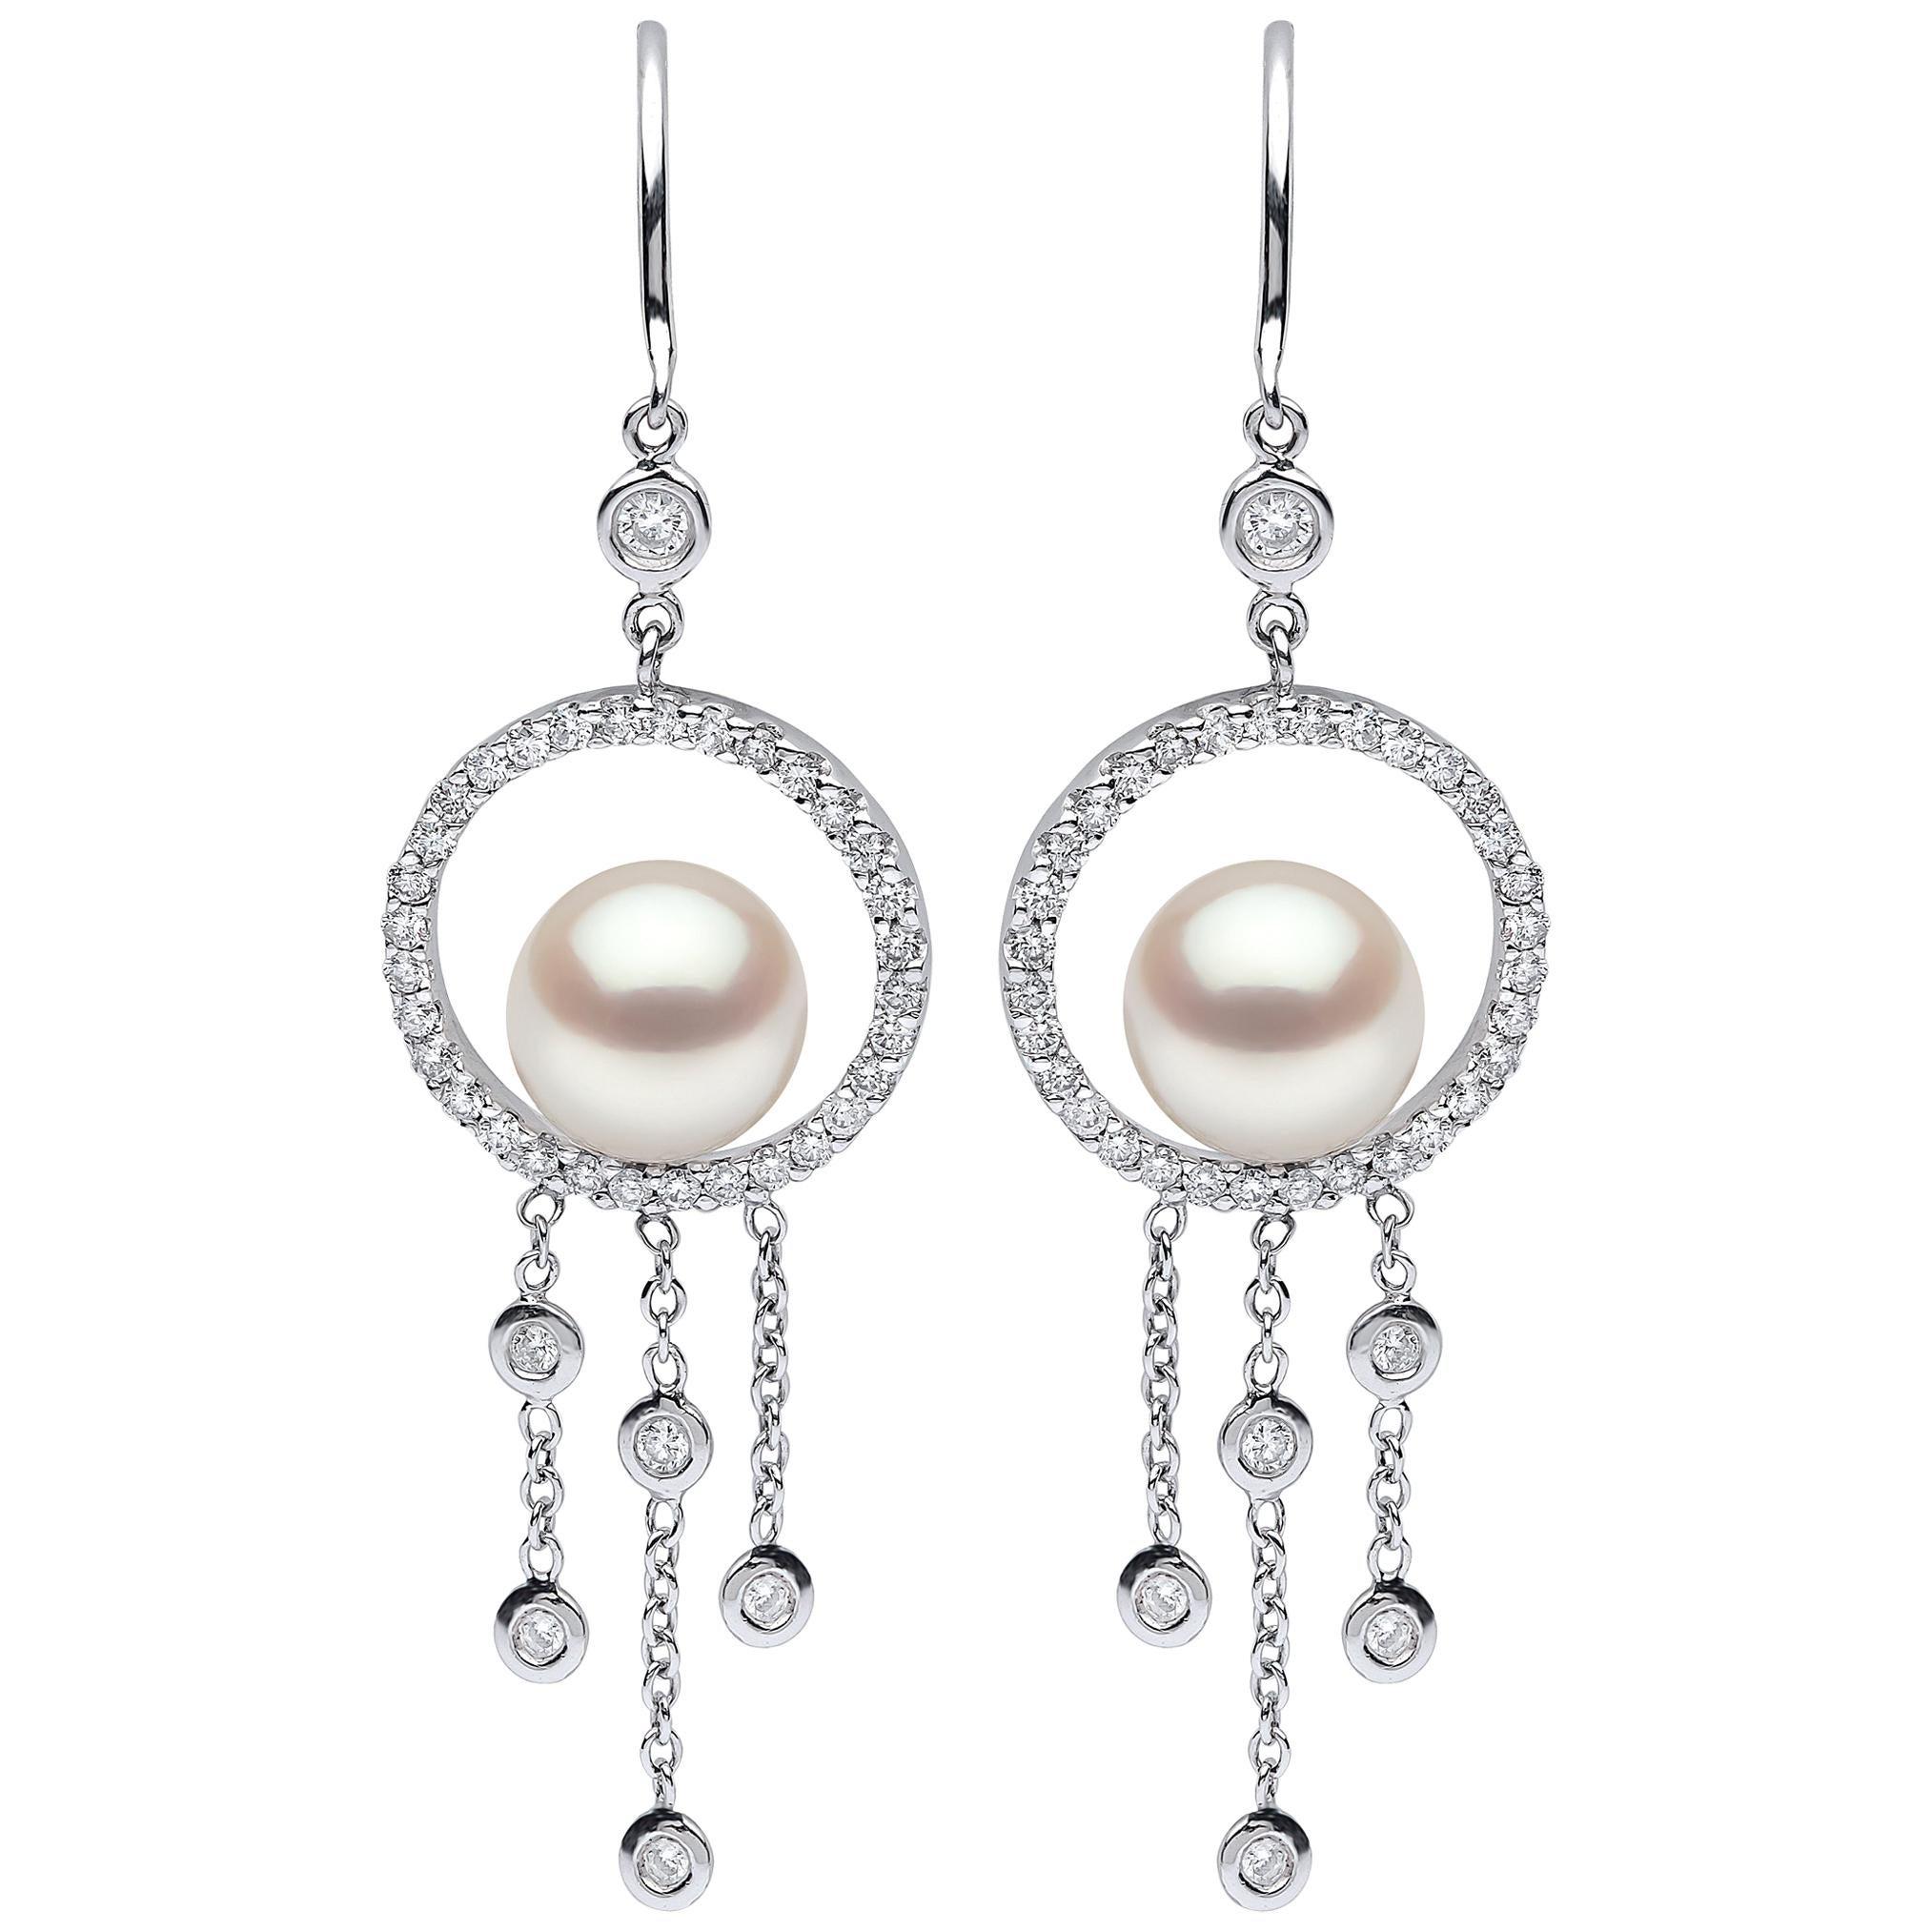 Yoko London Freshwater Pearl and Diamond Earrings in 18 Karat White Gold